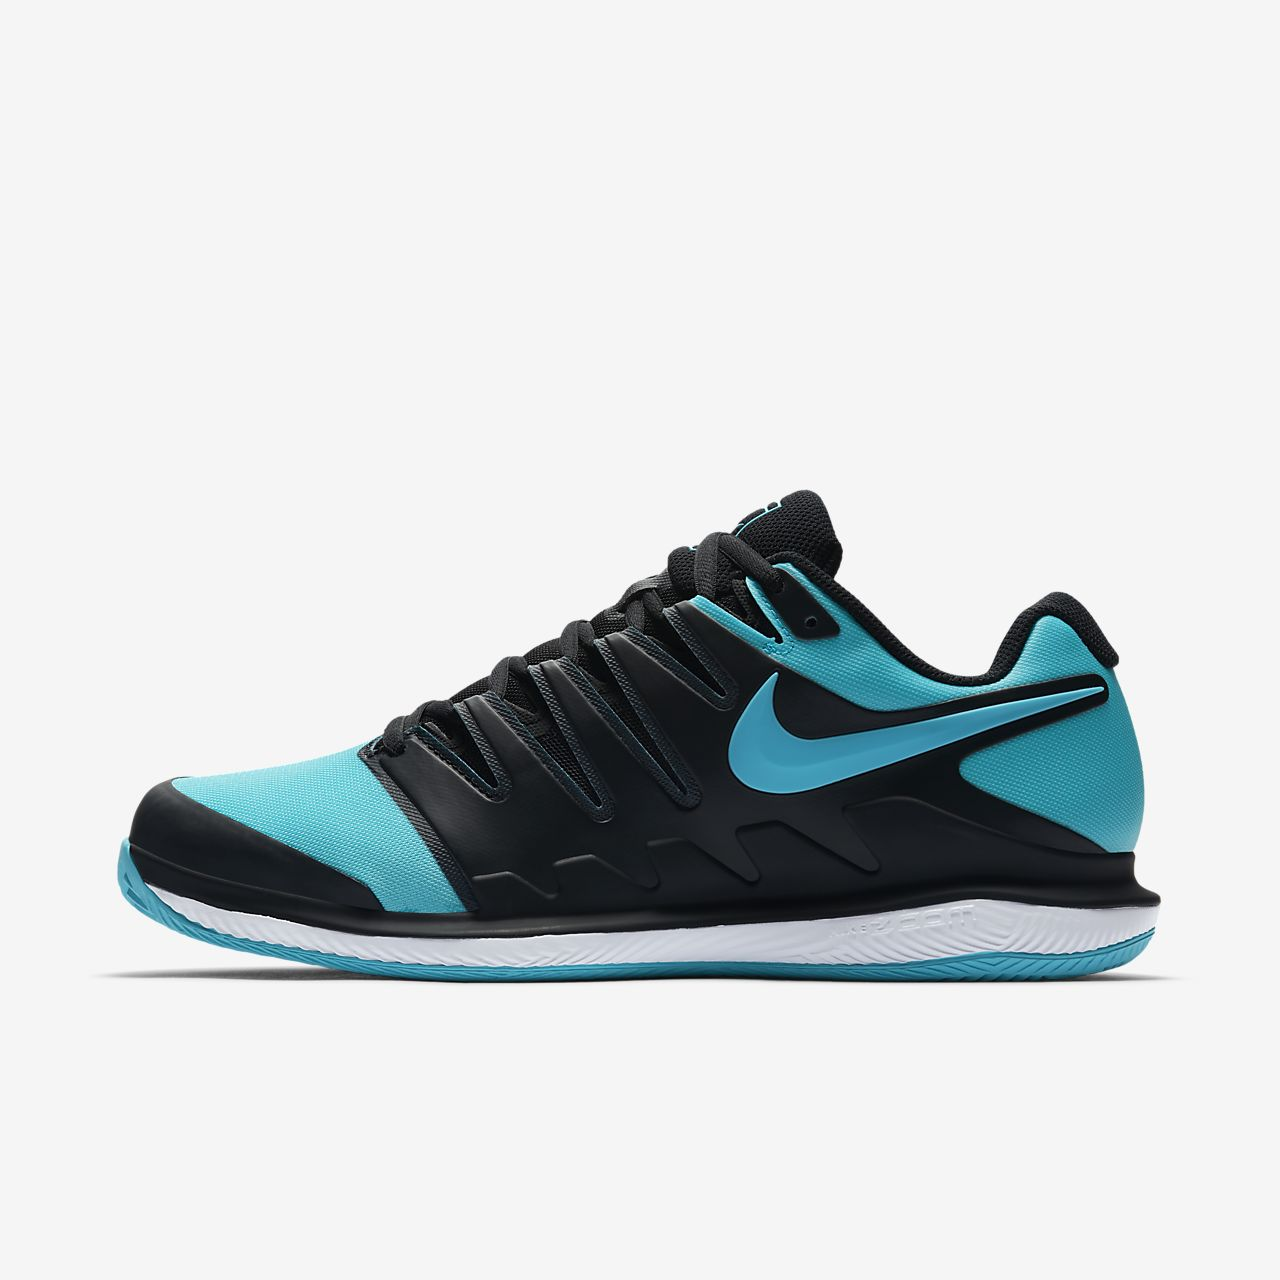 ... Nike Air Zoom Vapor X Clay Men's Tennis Shoe